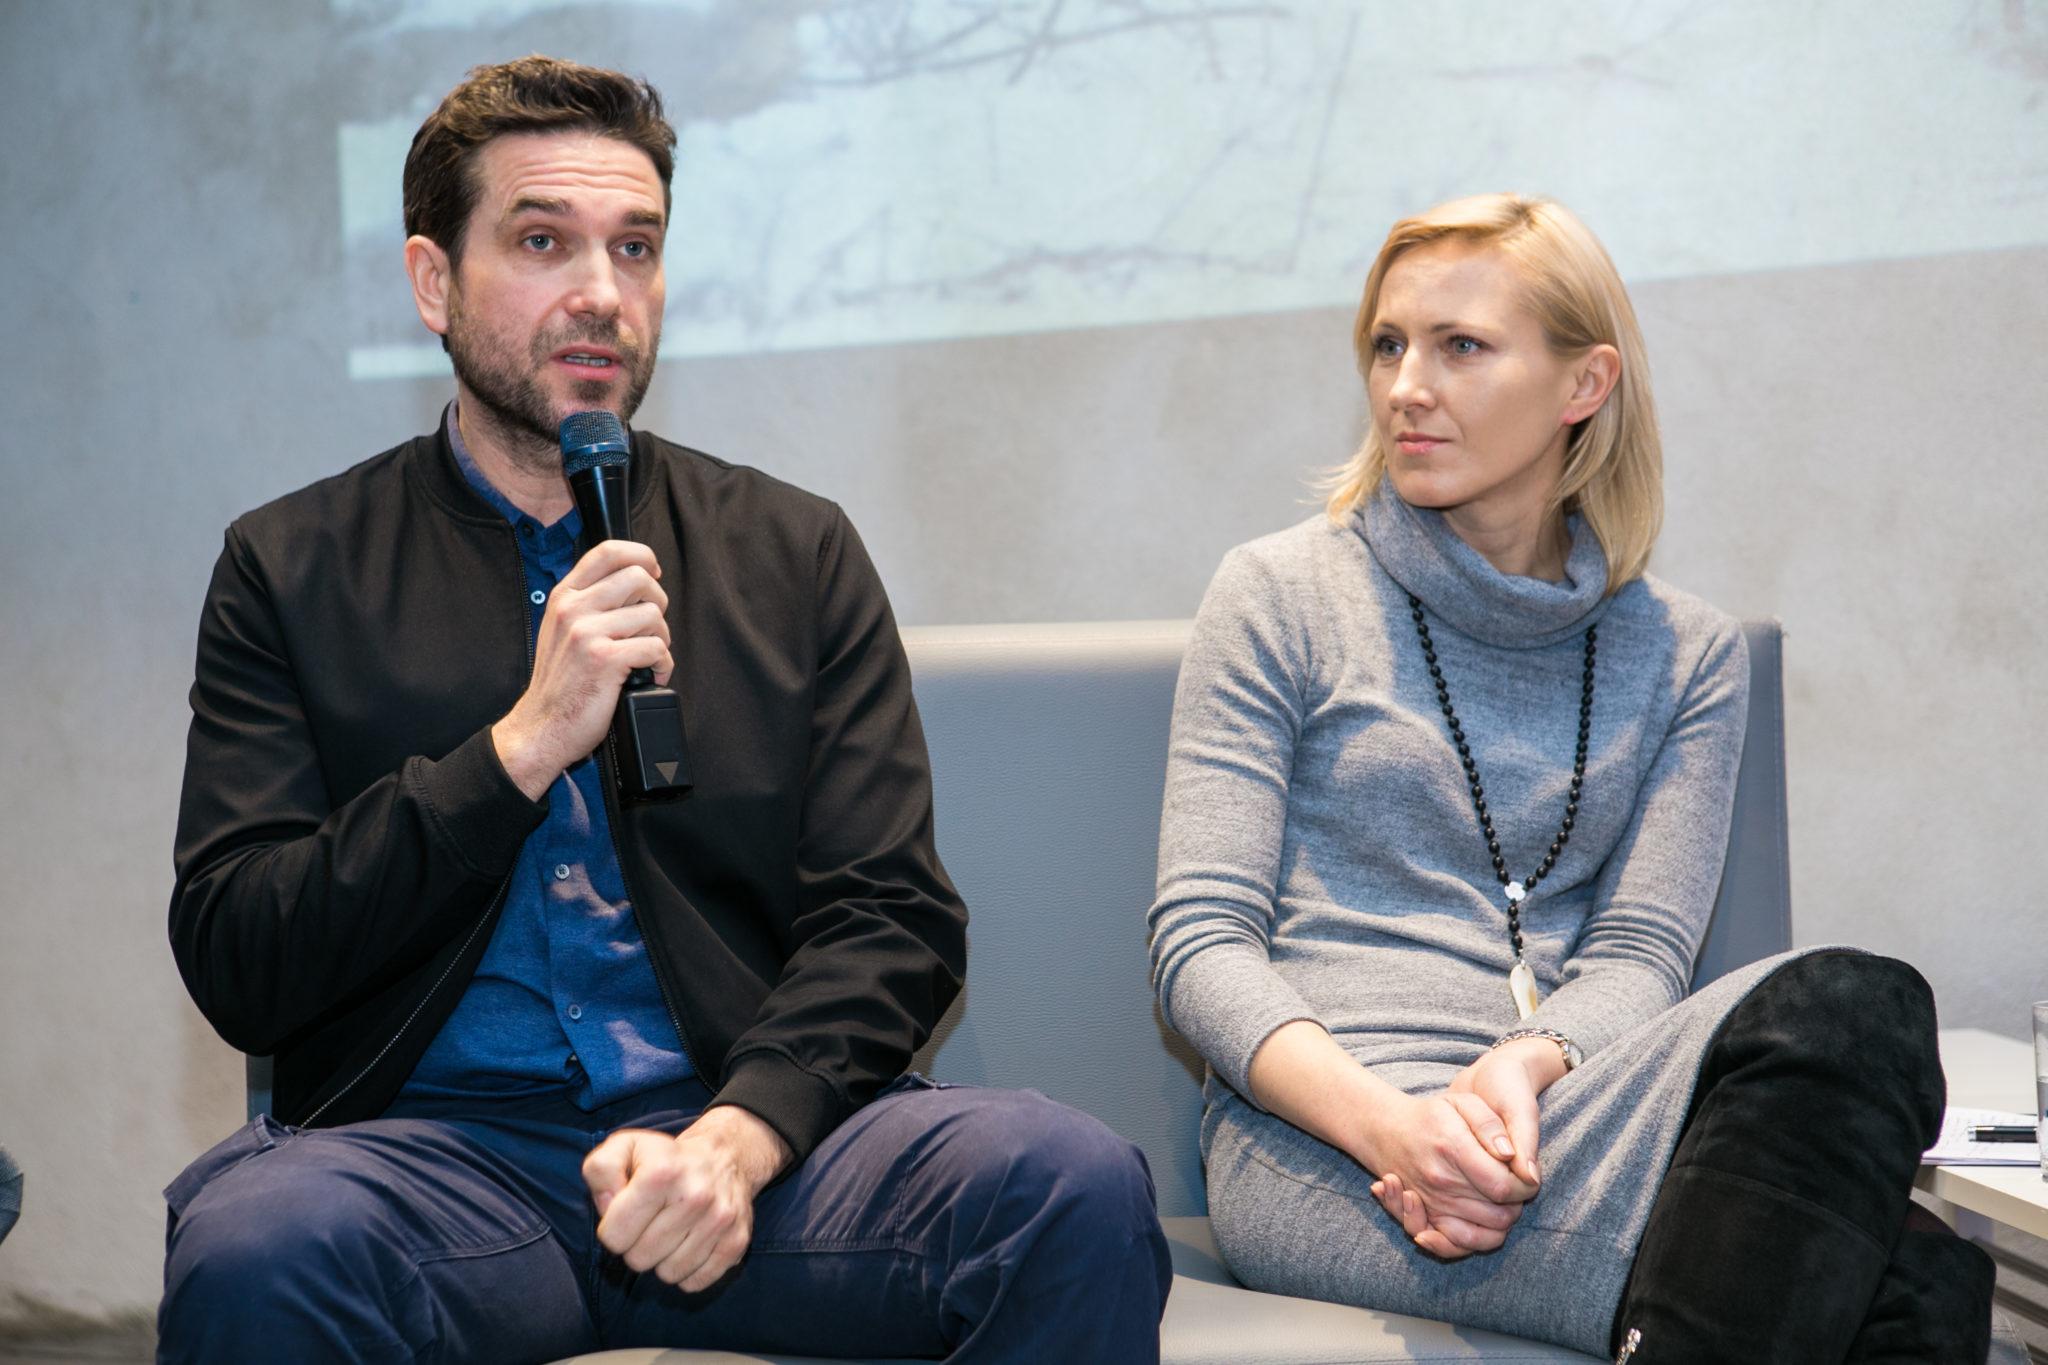 Marcin Dorociński z mikrofonem i Dorota Durakiewicz